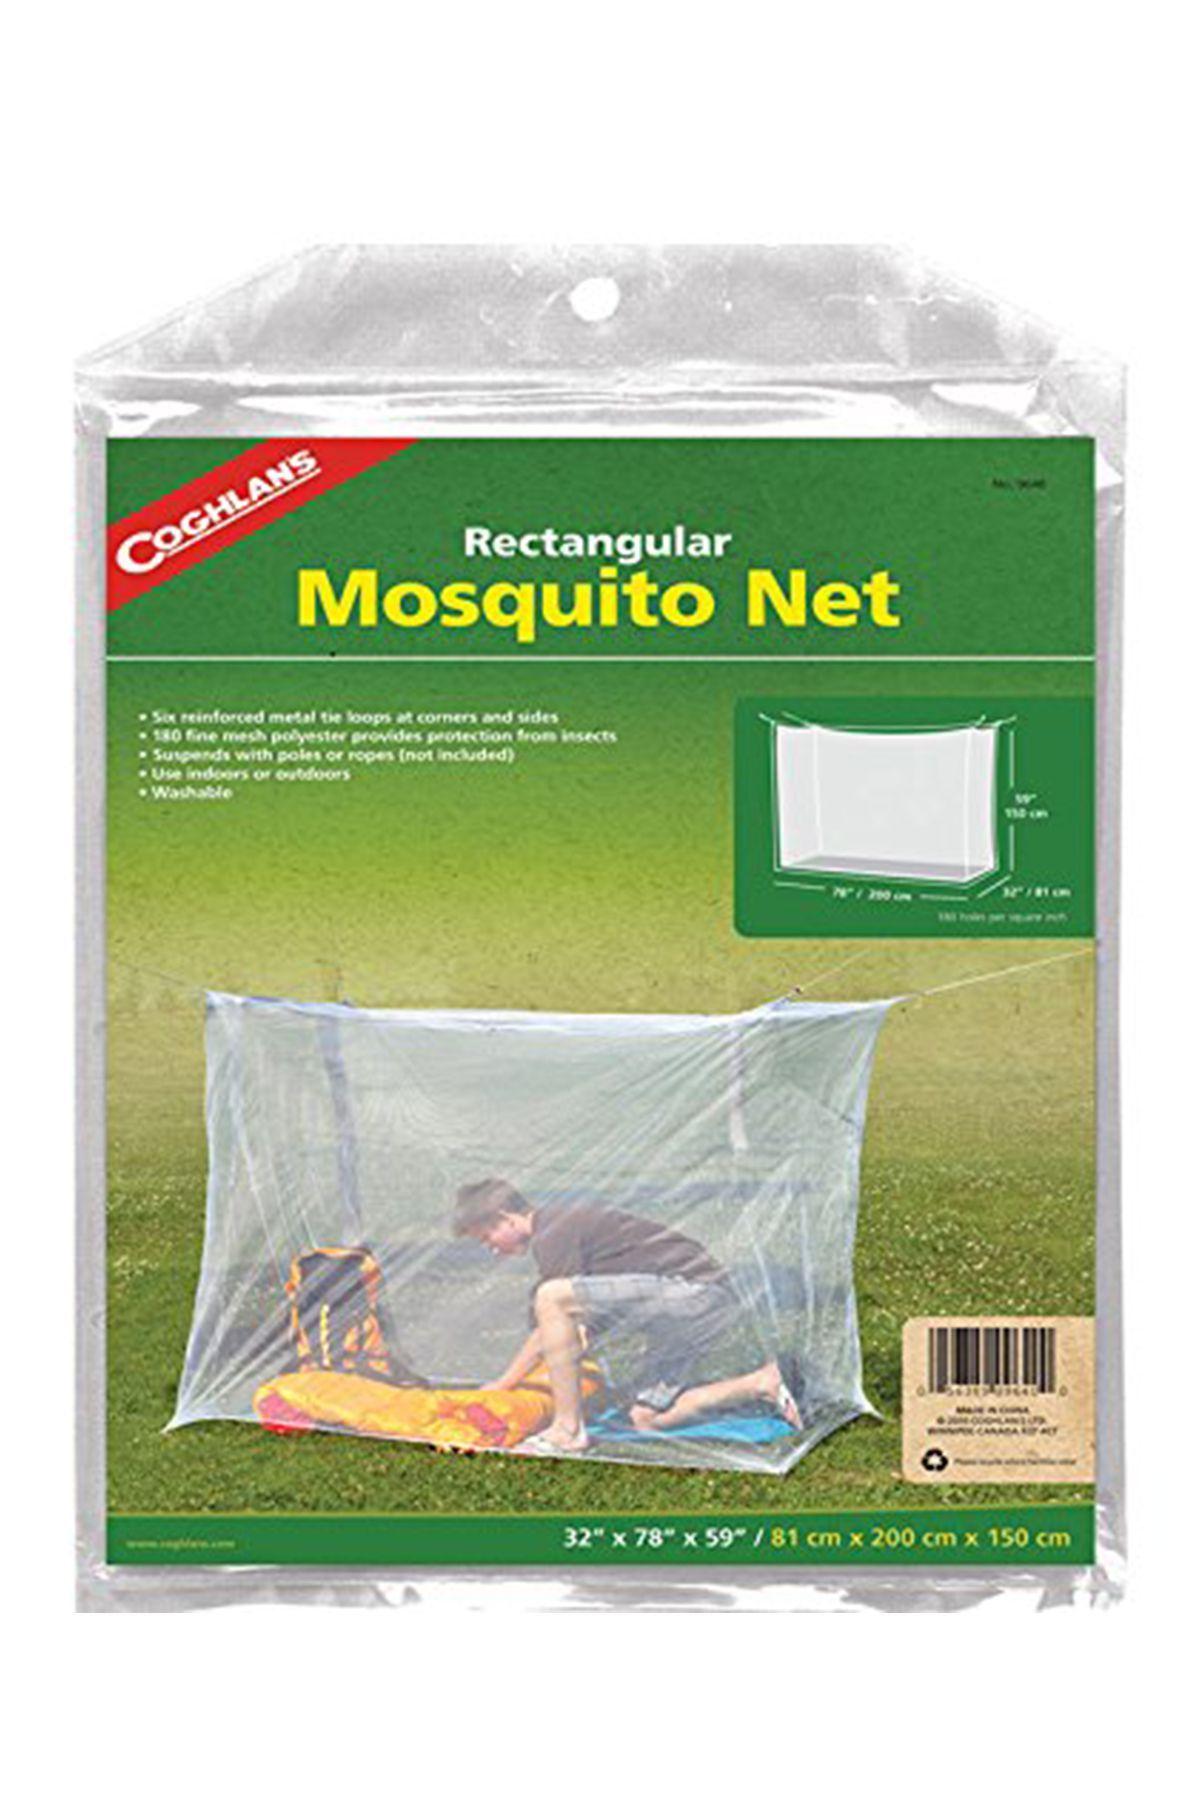 Sleep under a mosquito net